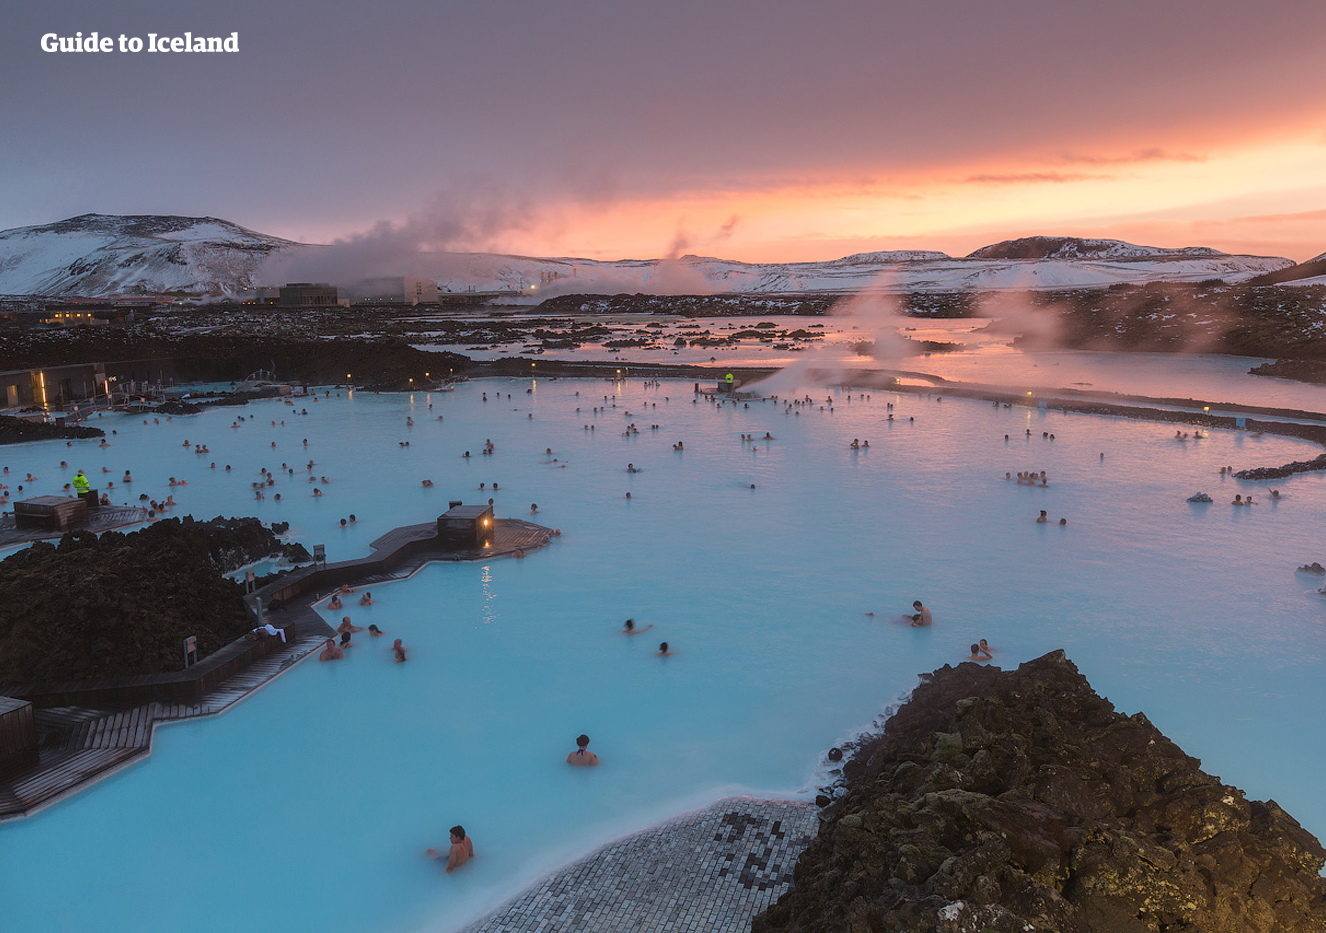 The Blue Lagoon Spa on Iceland's Reykjanes Peninsula.